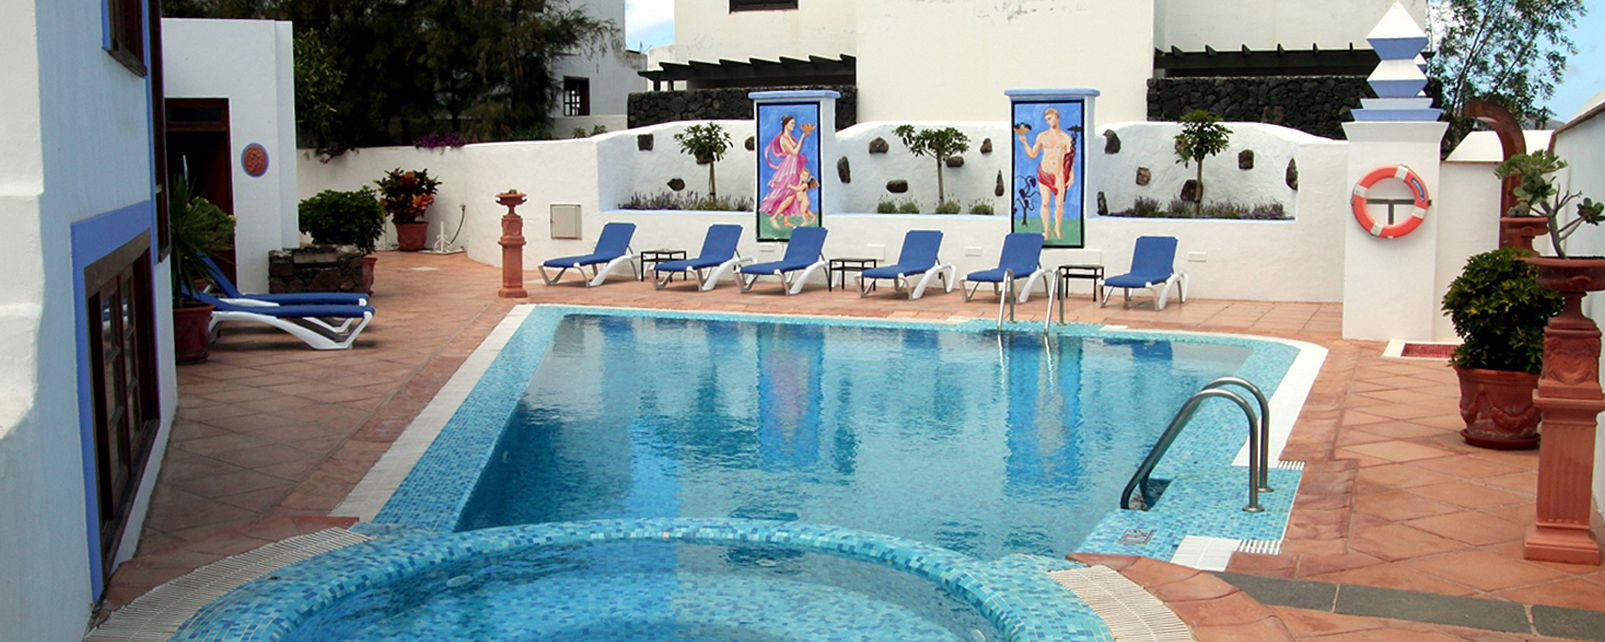 Hotel Casona de Yaiza